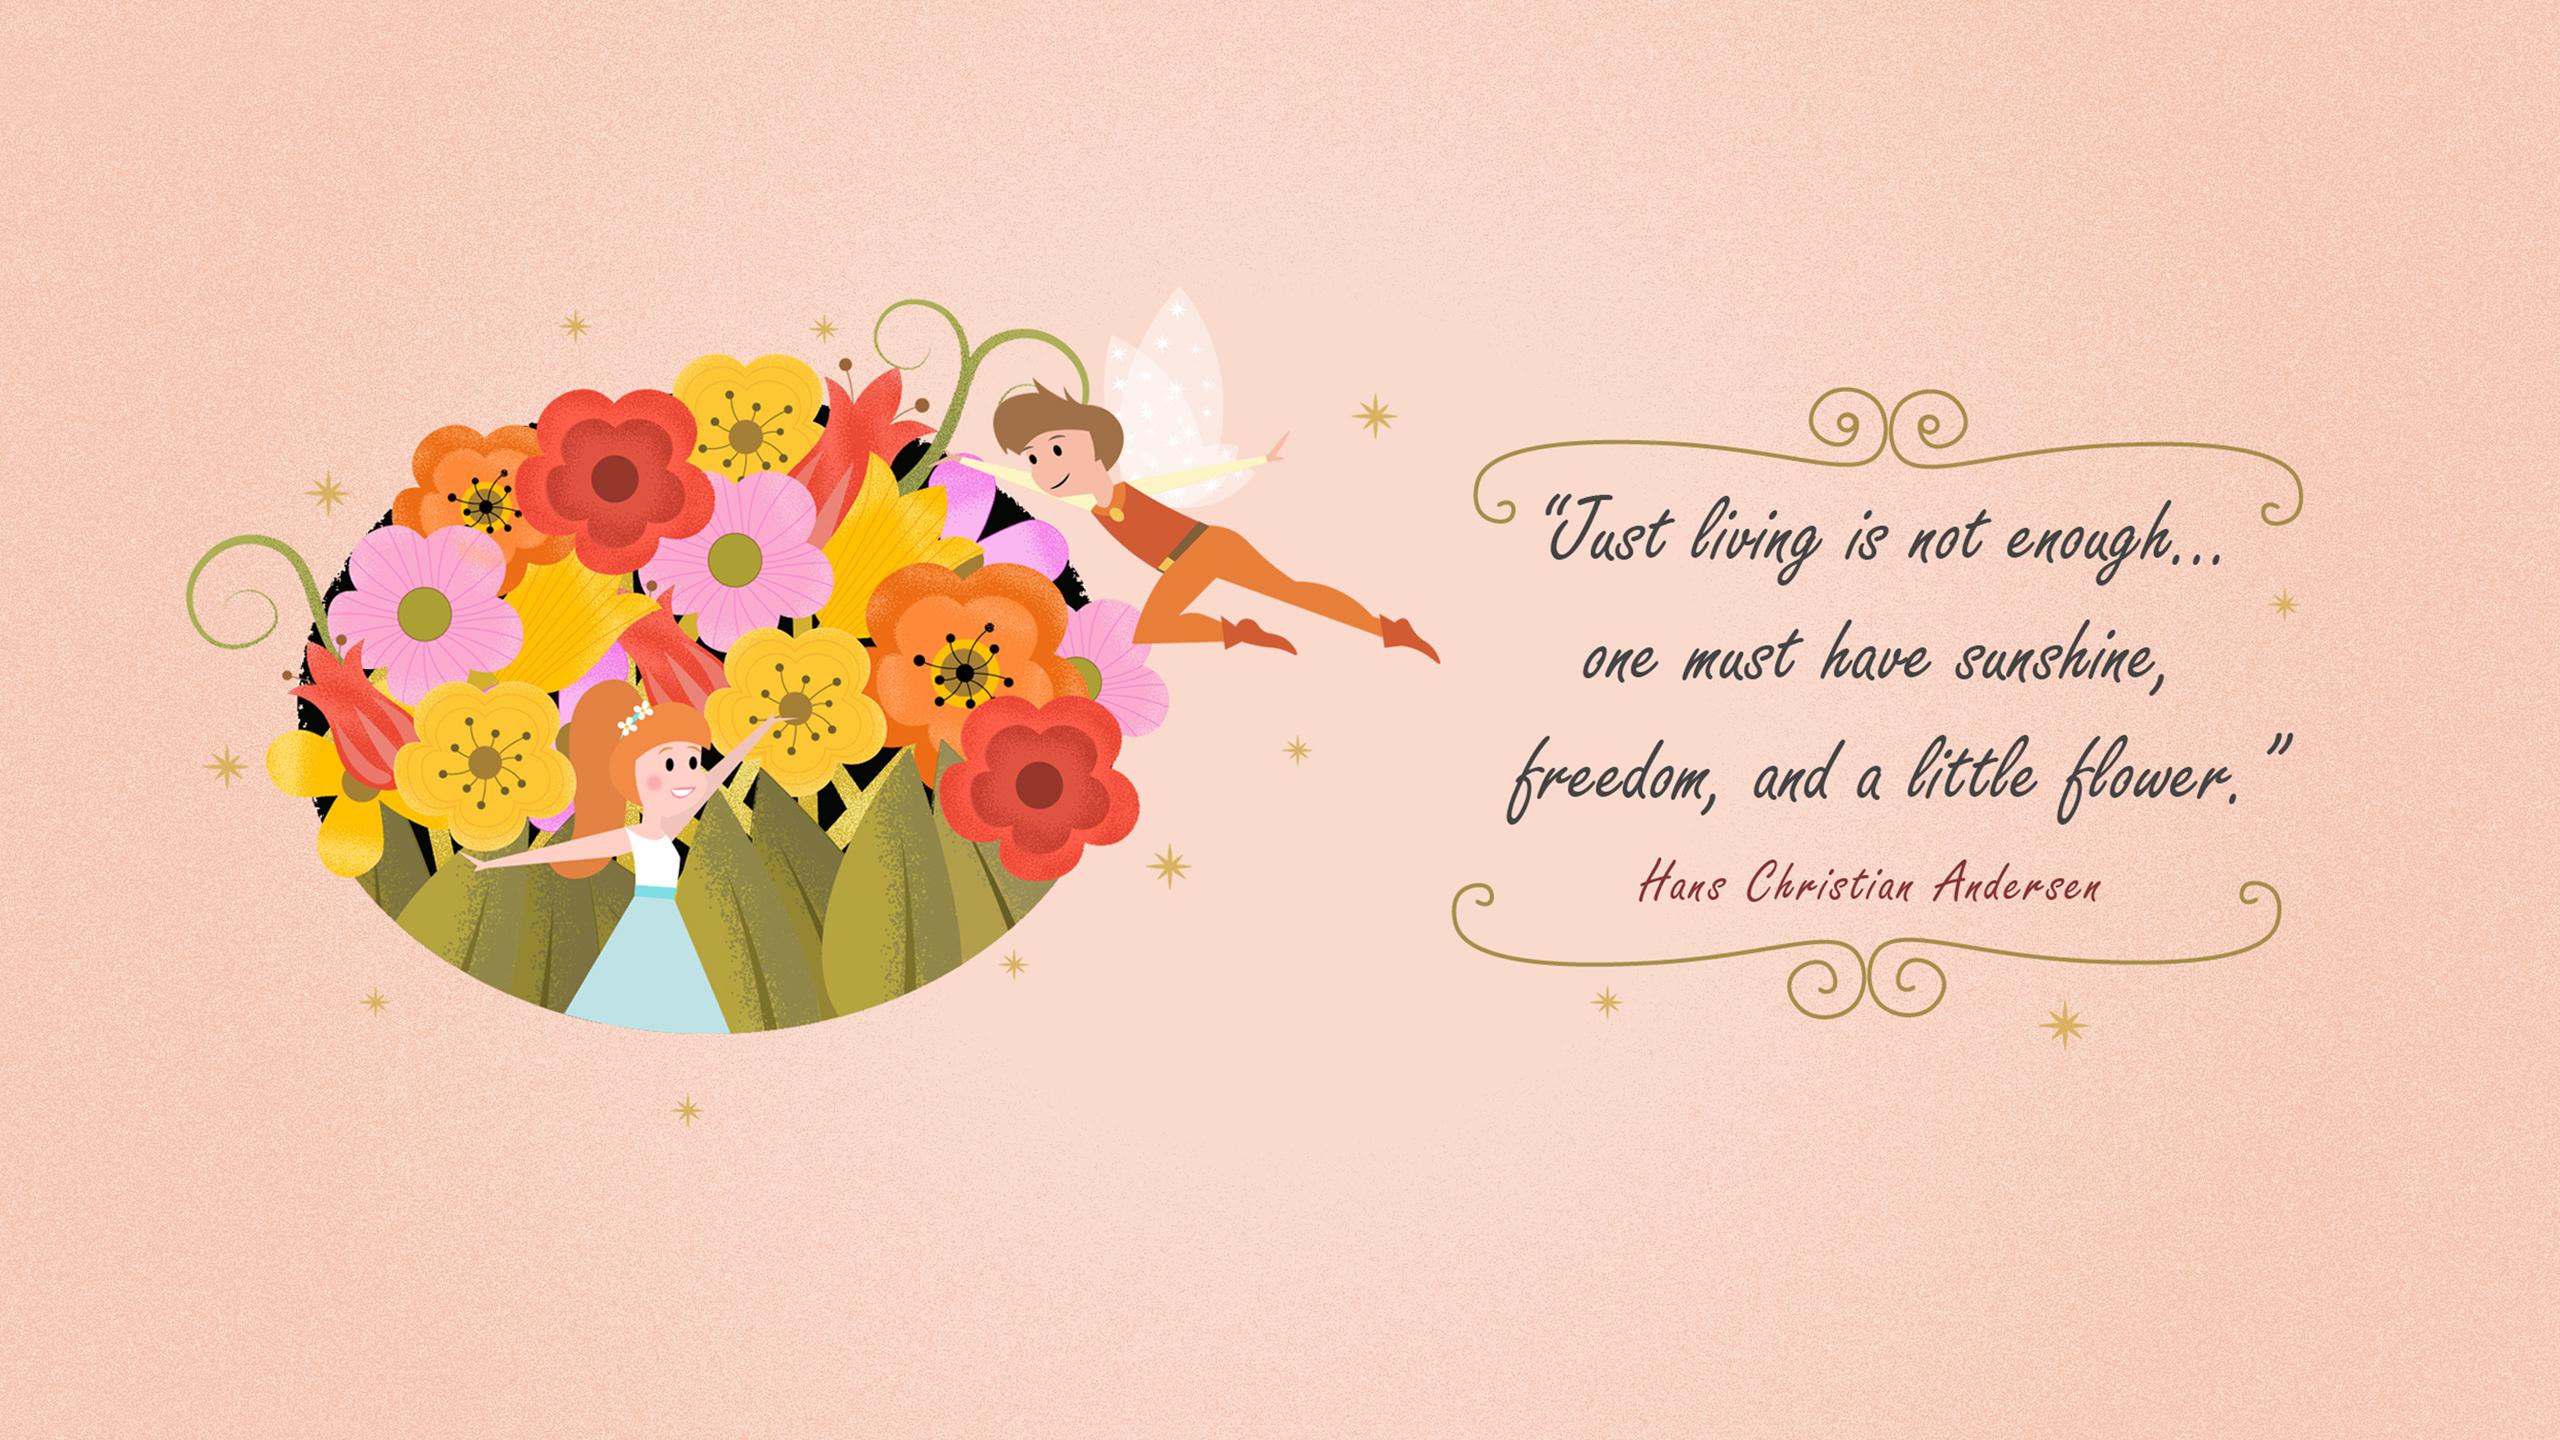 Sunshine Freedom Popular Quotes